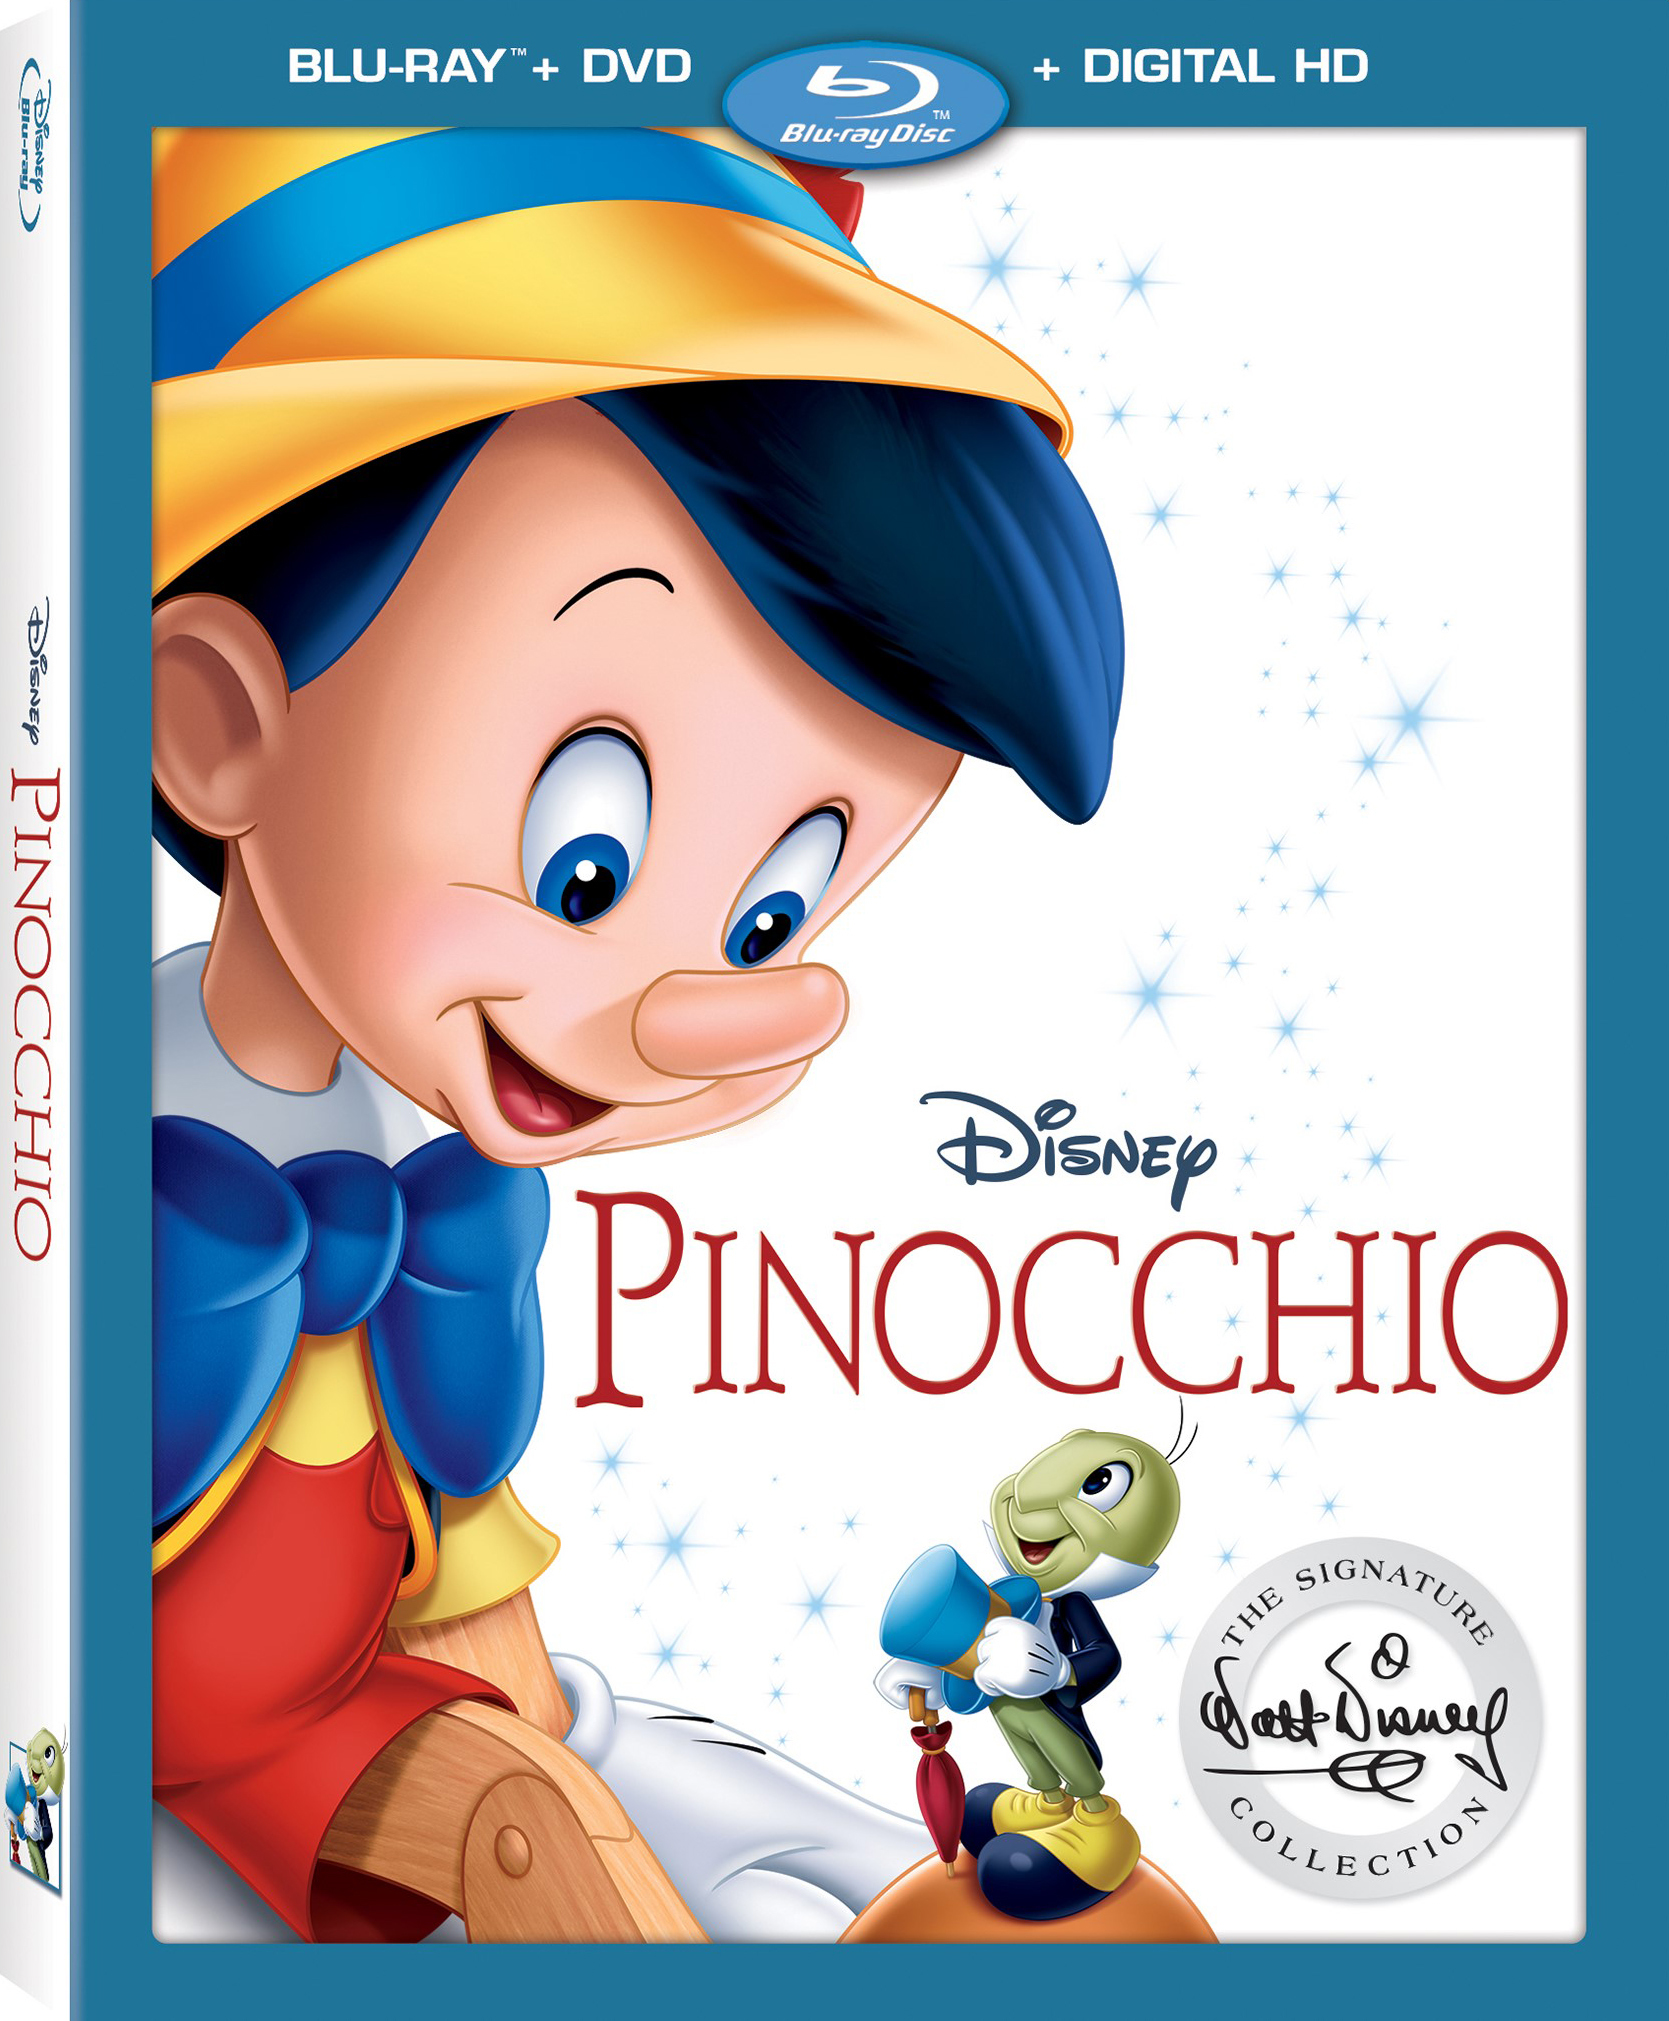 image pinocchio slipcover walt disney signature collection jpg